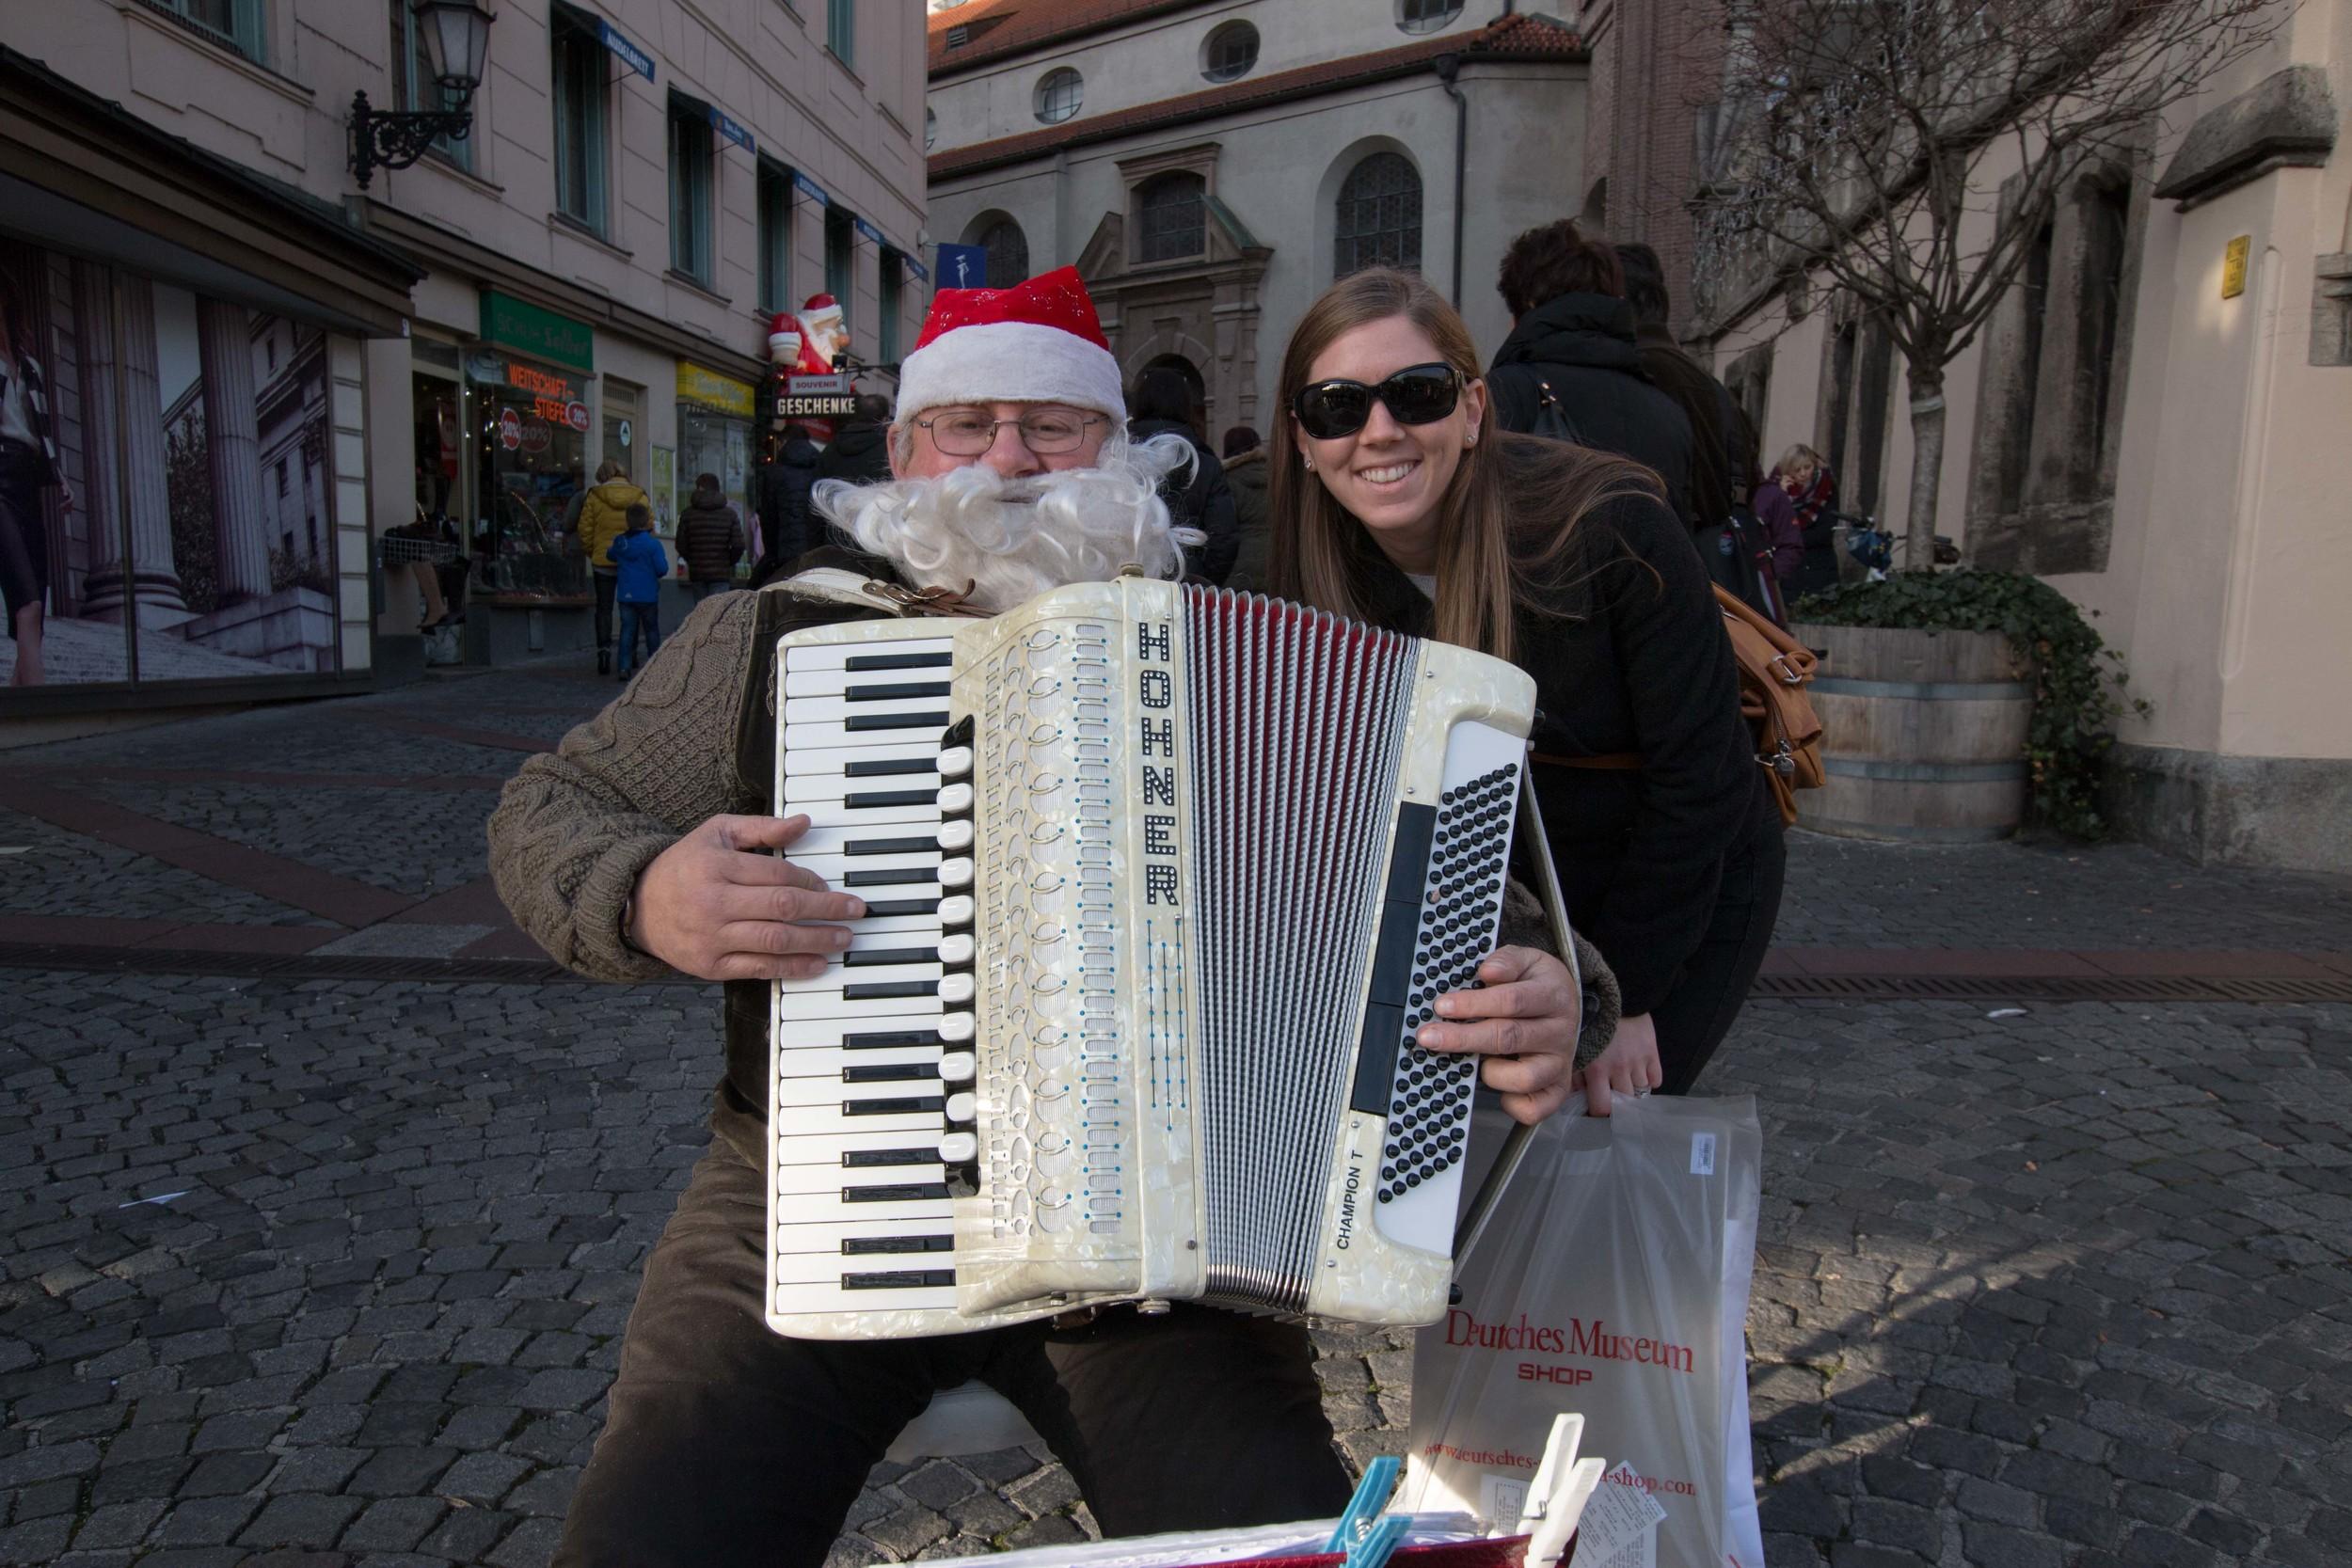 Meghan with Santa Claus